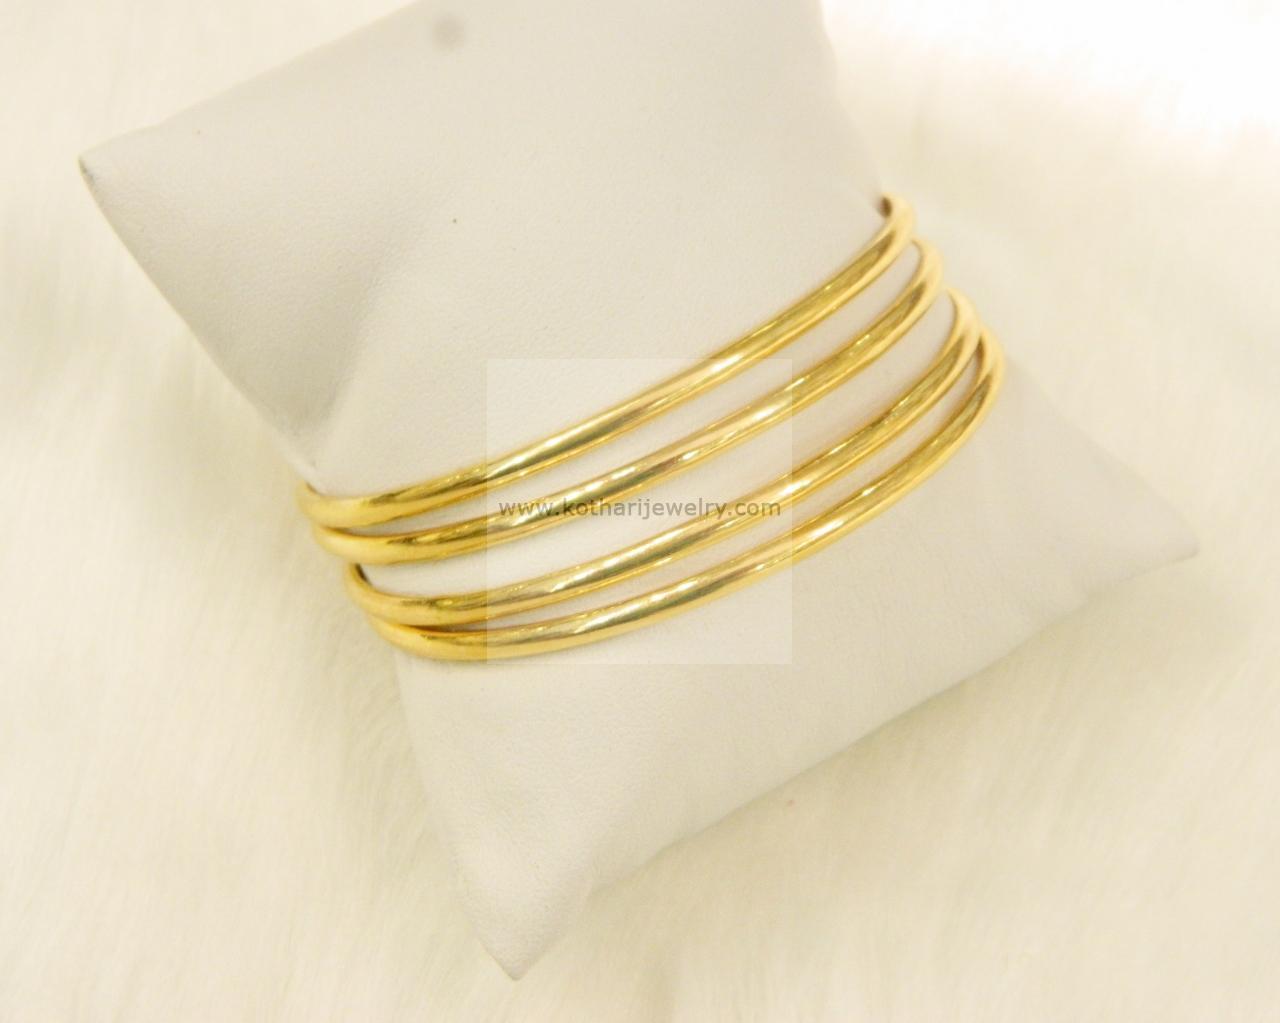 dress - Gold Indian bangles 22k video